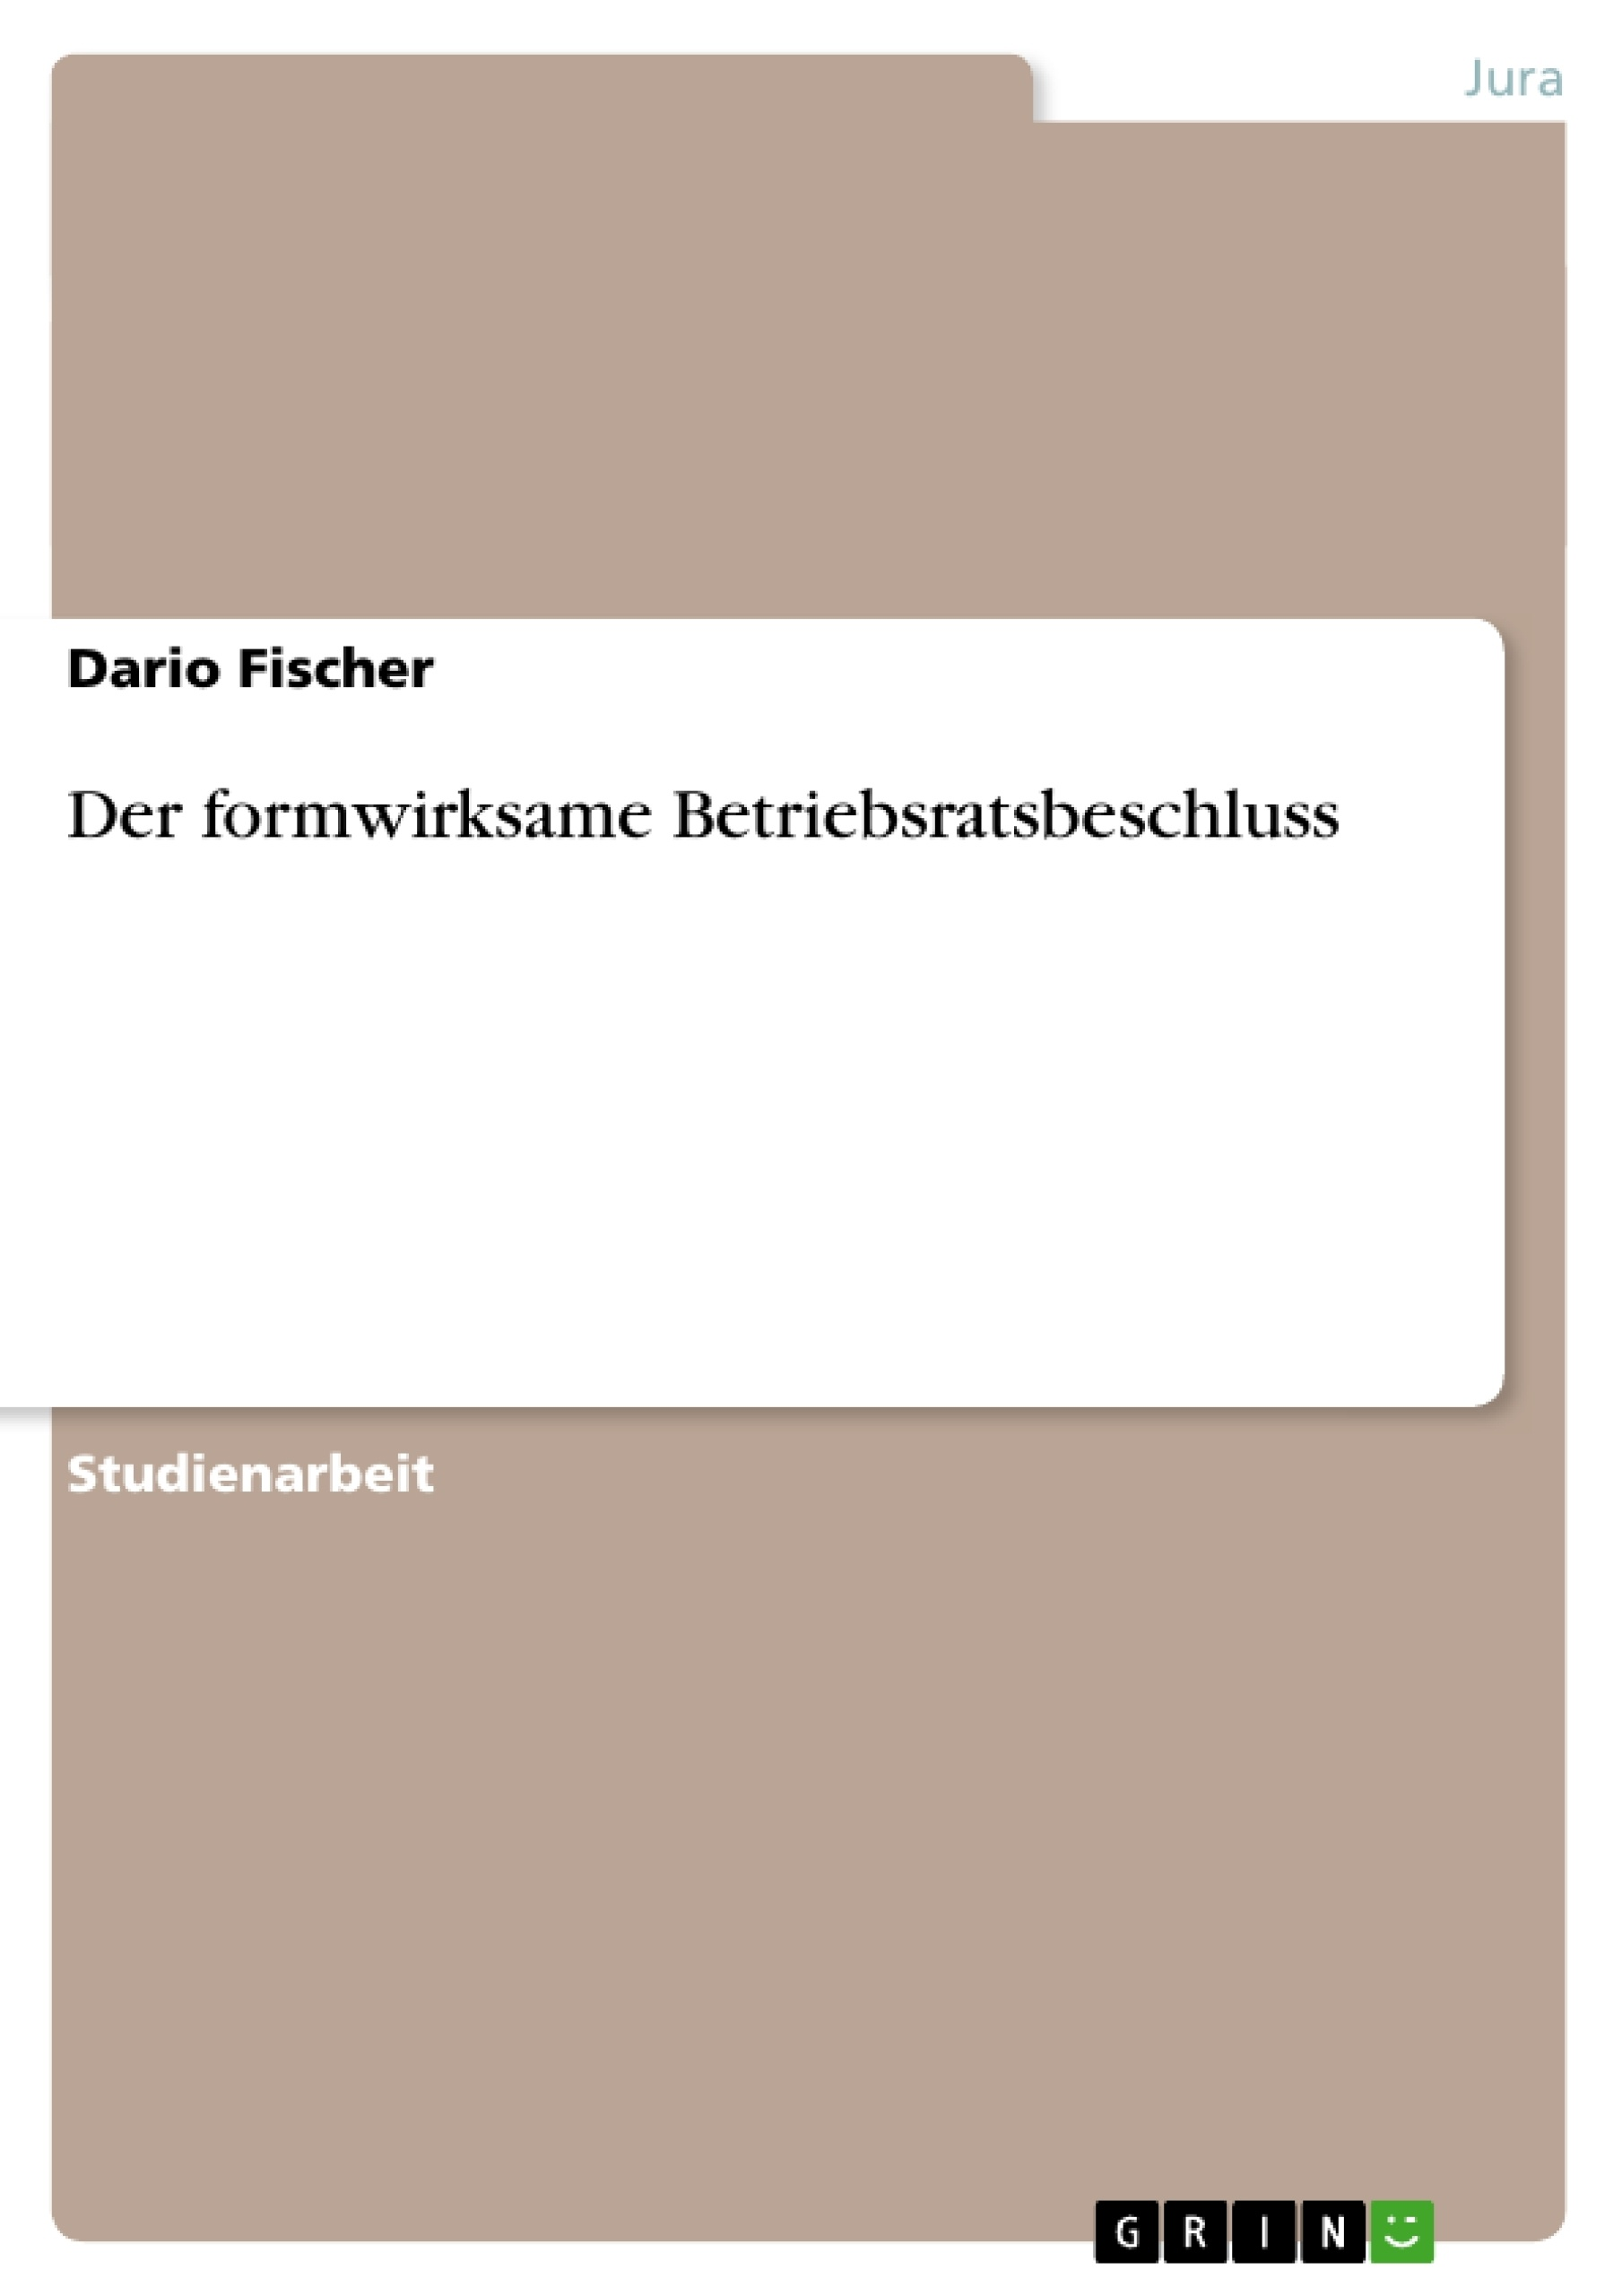 Titel: Der formwirksame Betriebsratsbeschluss